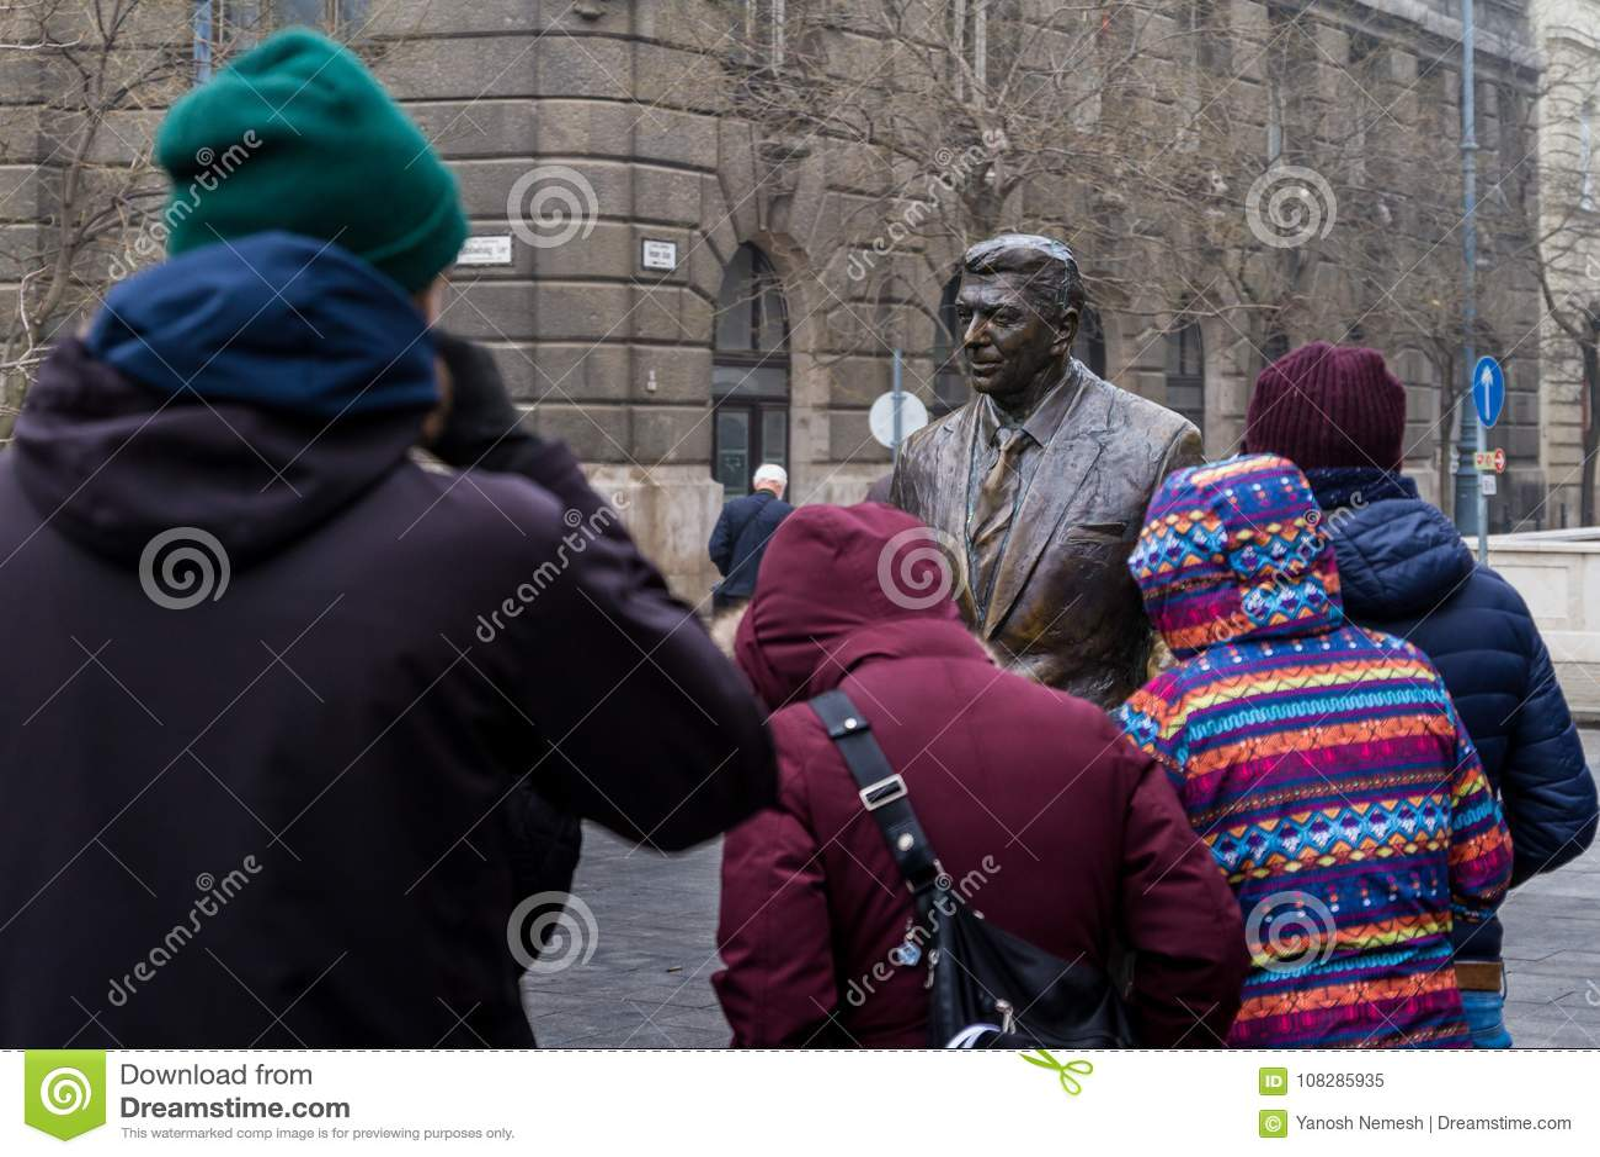 Ronald Reagan Statue in Budapest